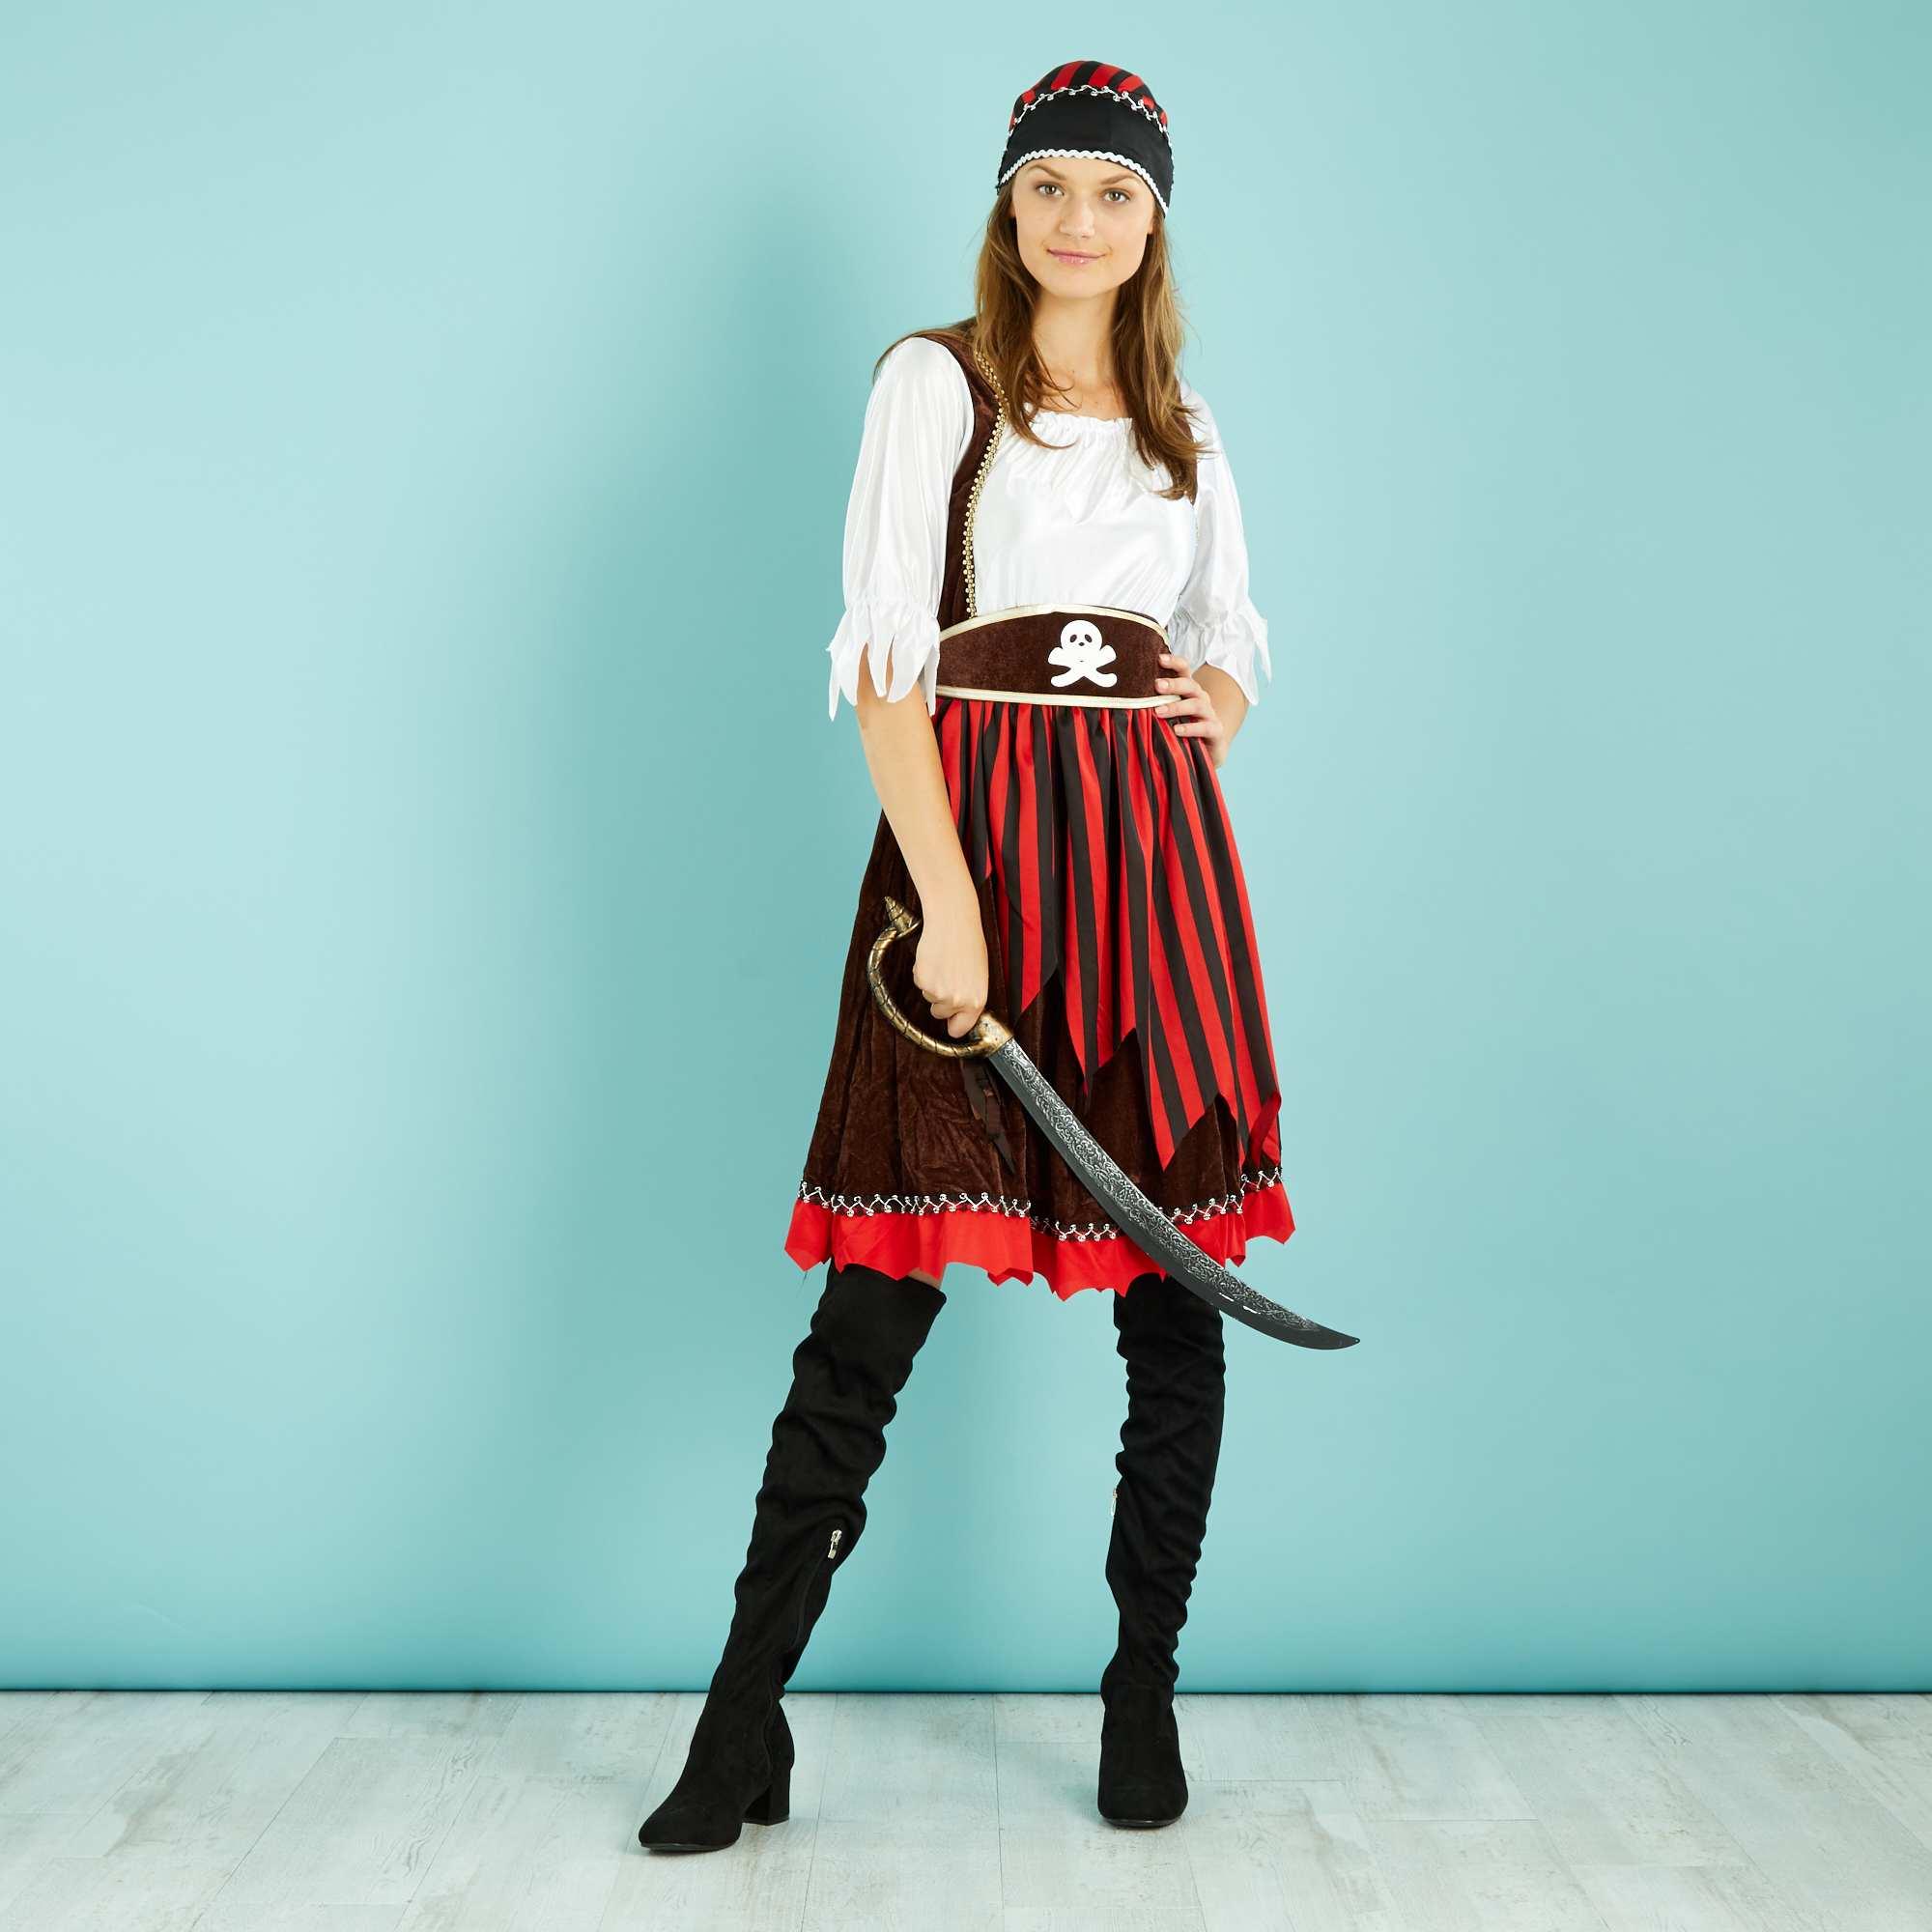 disfraz de pirata mujer kiabi 20 00. Black Bedroom Furniture Sets. Home Design Ideas